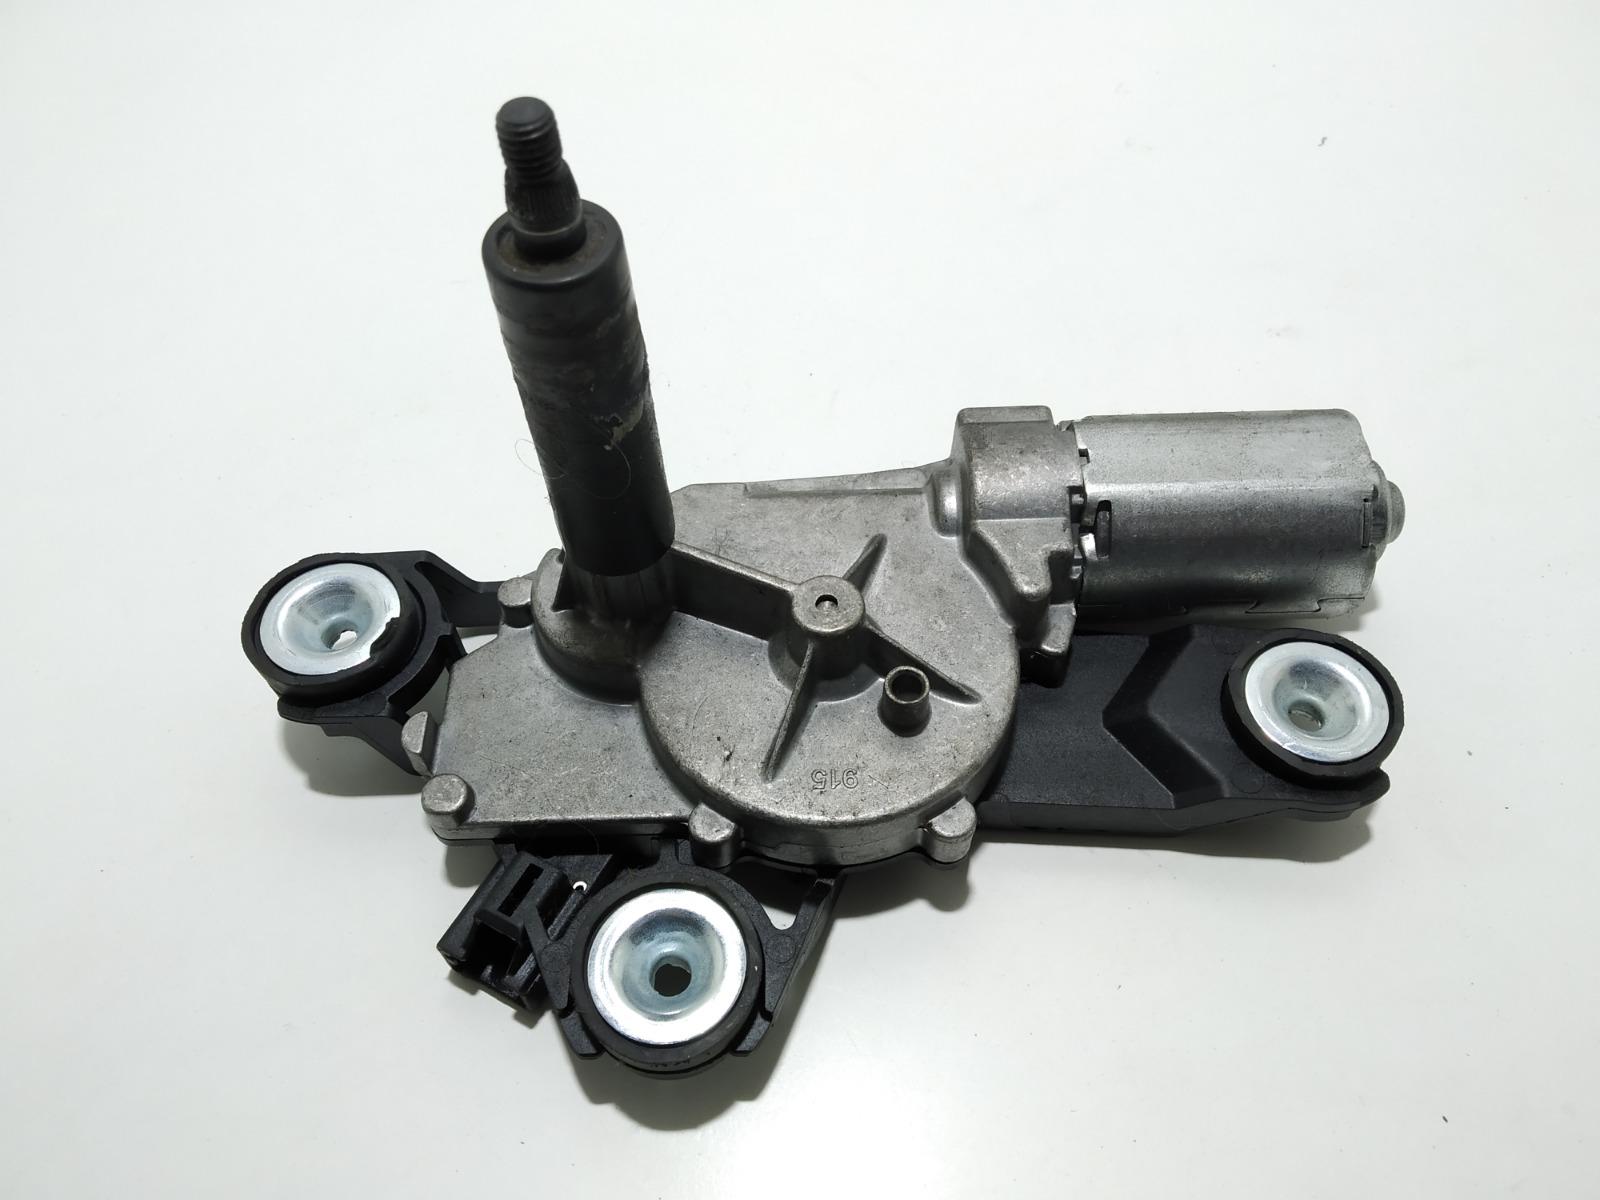 Моторчик заднего стеклоочистителя (дворника) Ford Galaxy 1.8 TDCI 2007 (б/у)